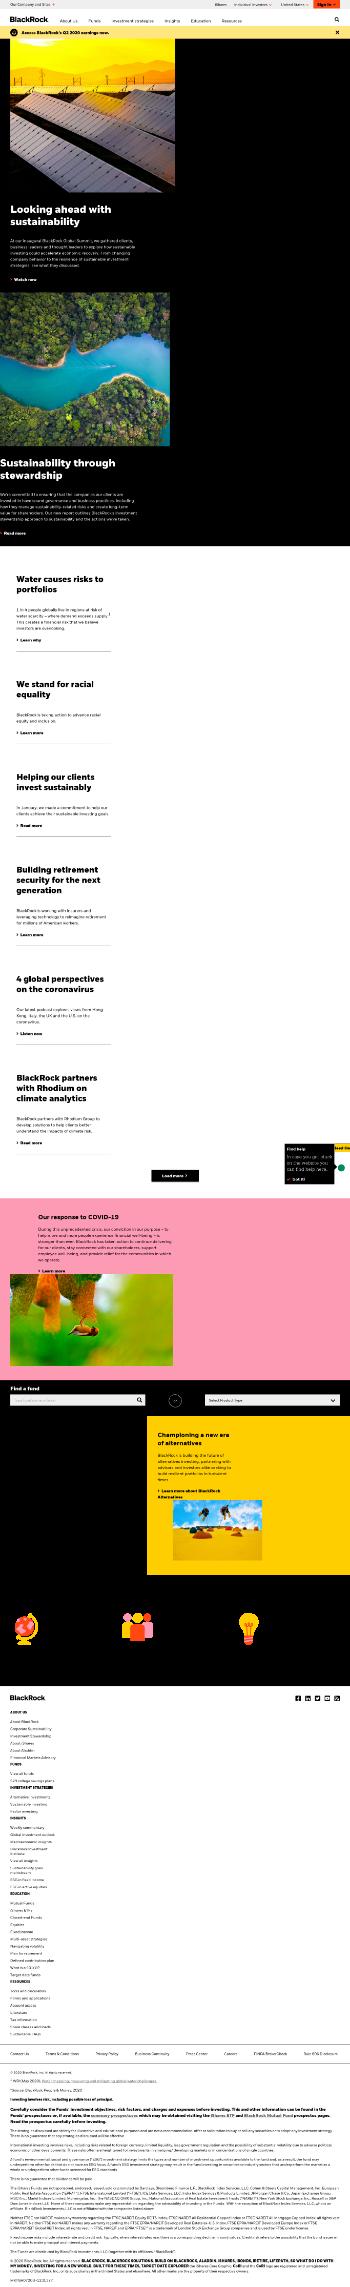 BlackRock MuniVest Fund, Inc. Website Screenshot